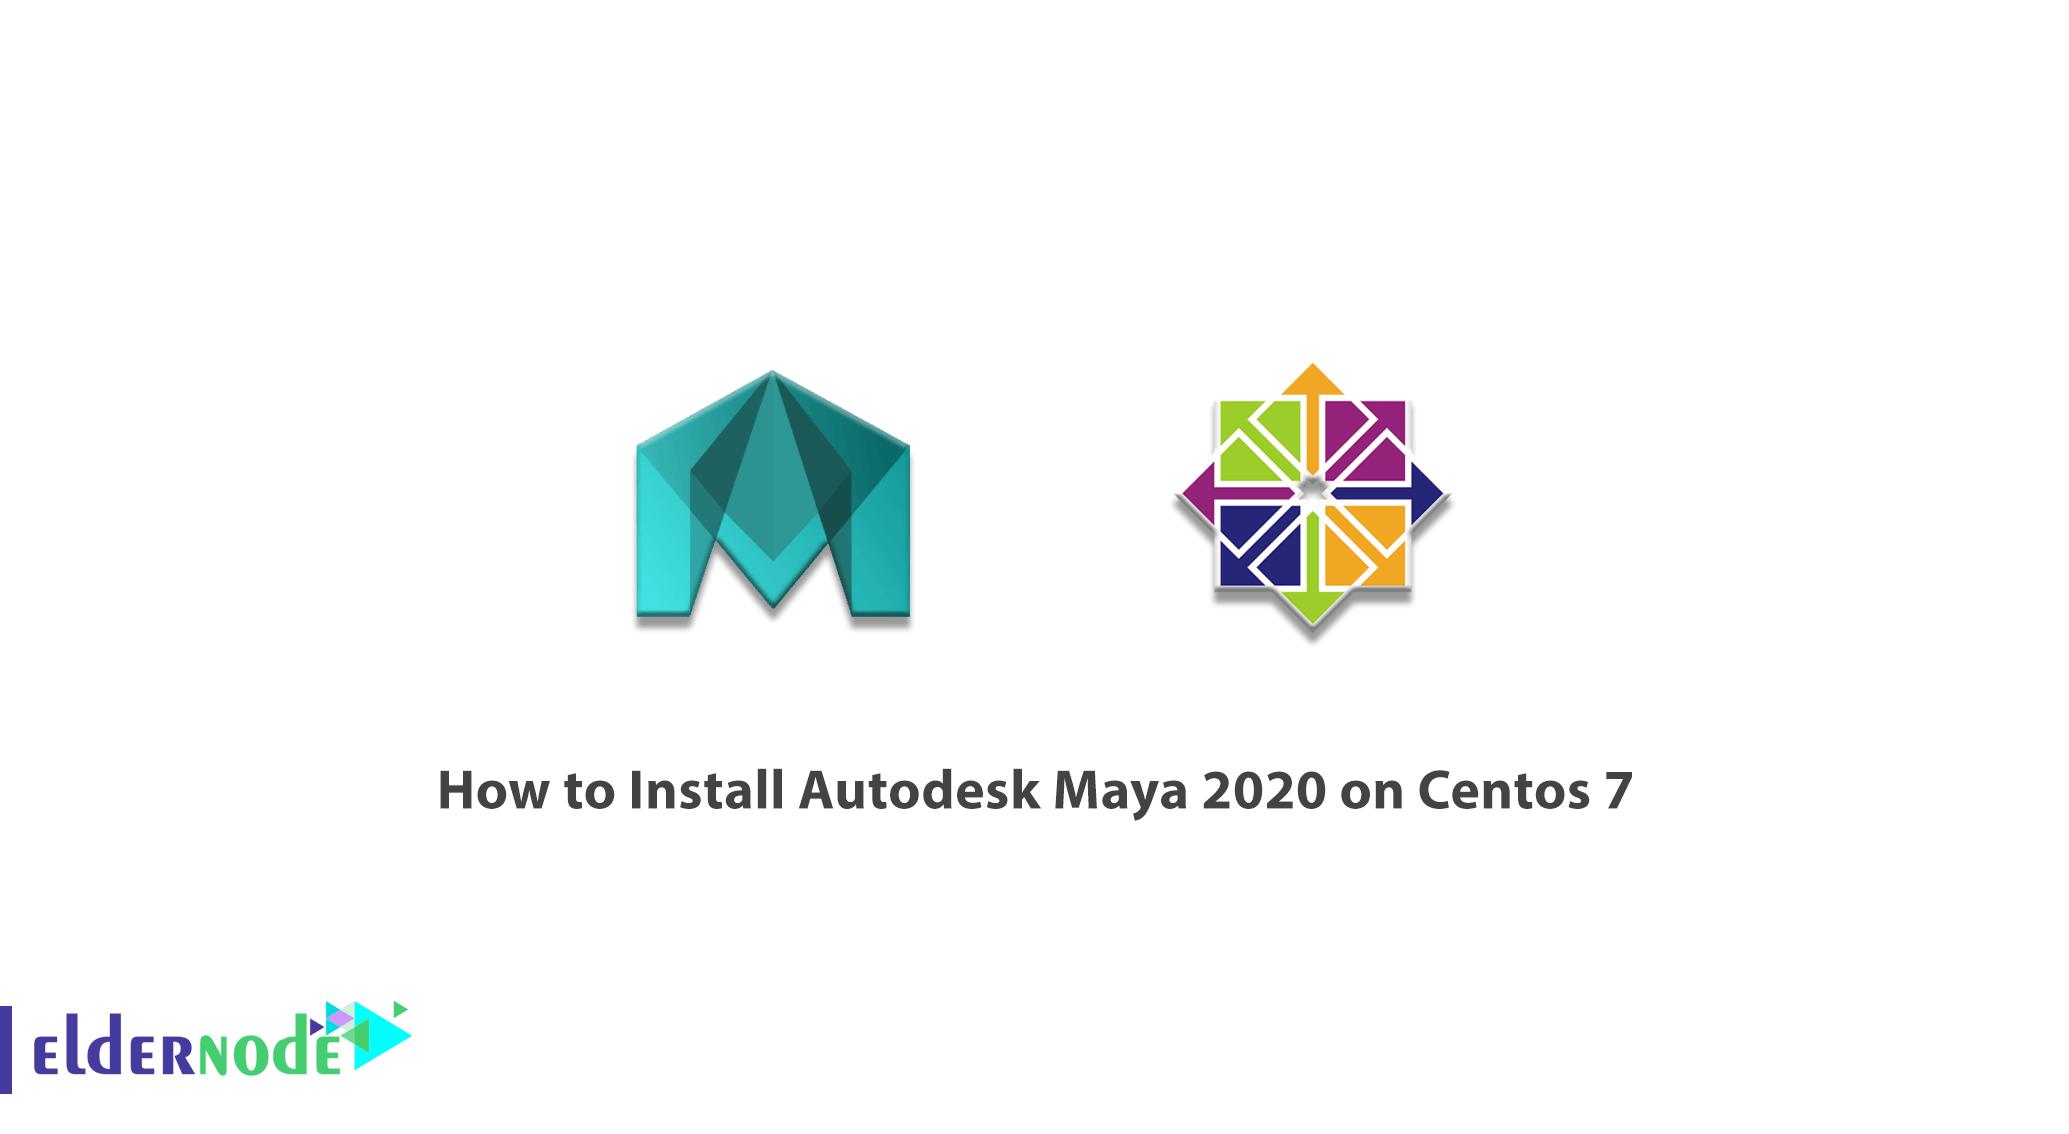 How to Install Autodesk Maya 2020 on Centos 7